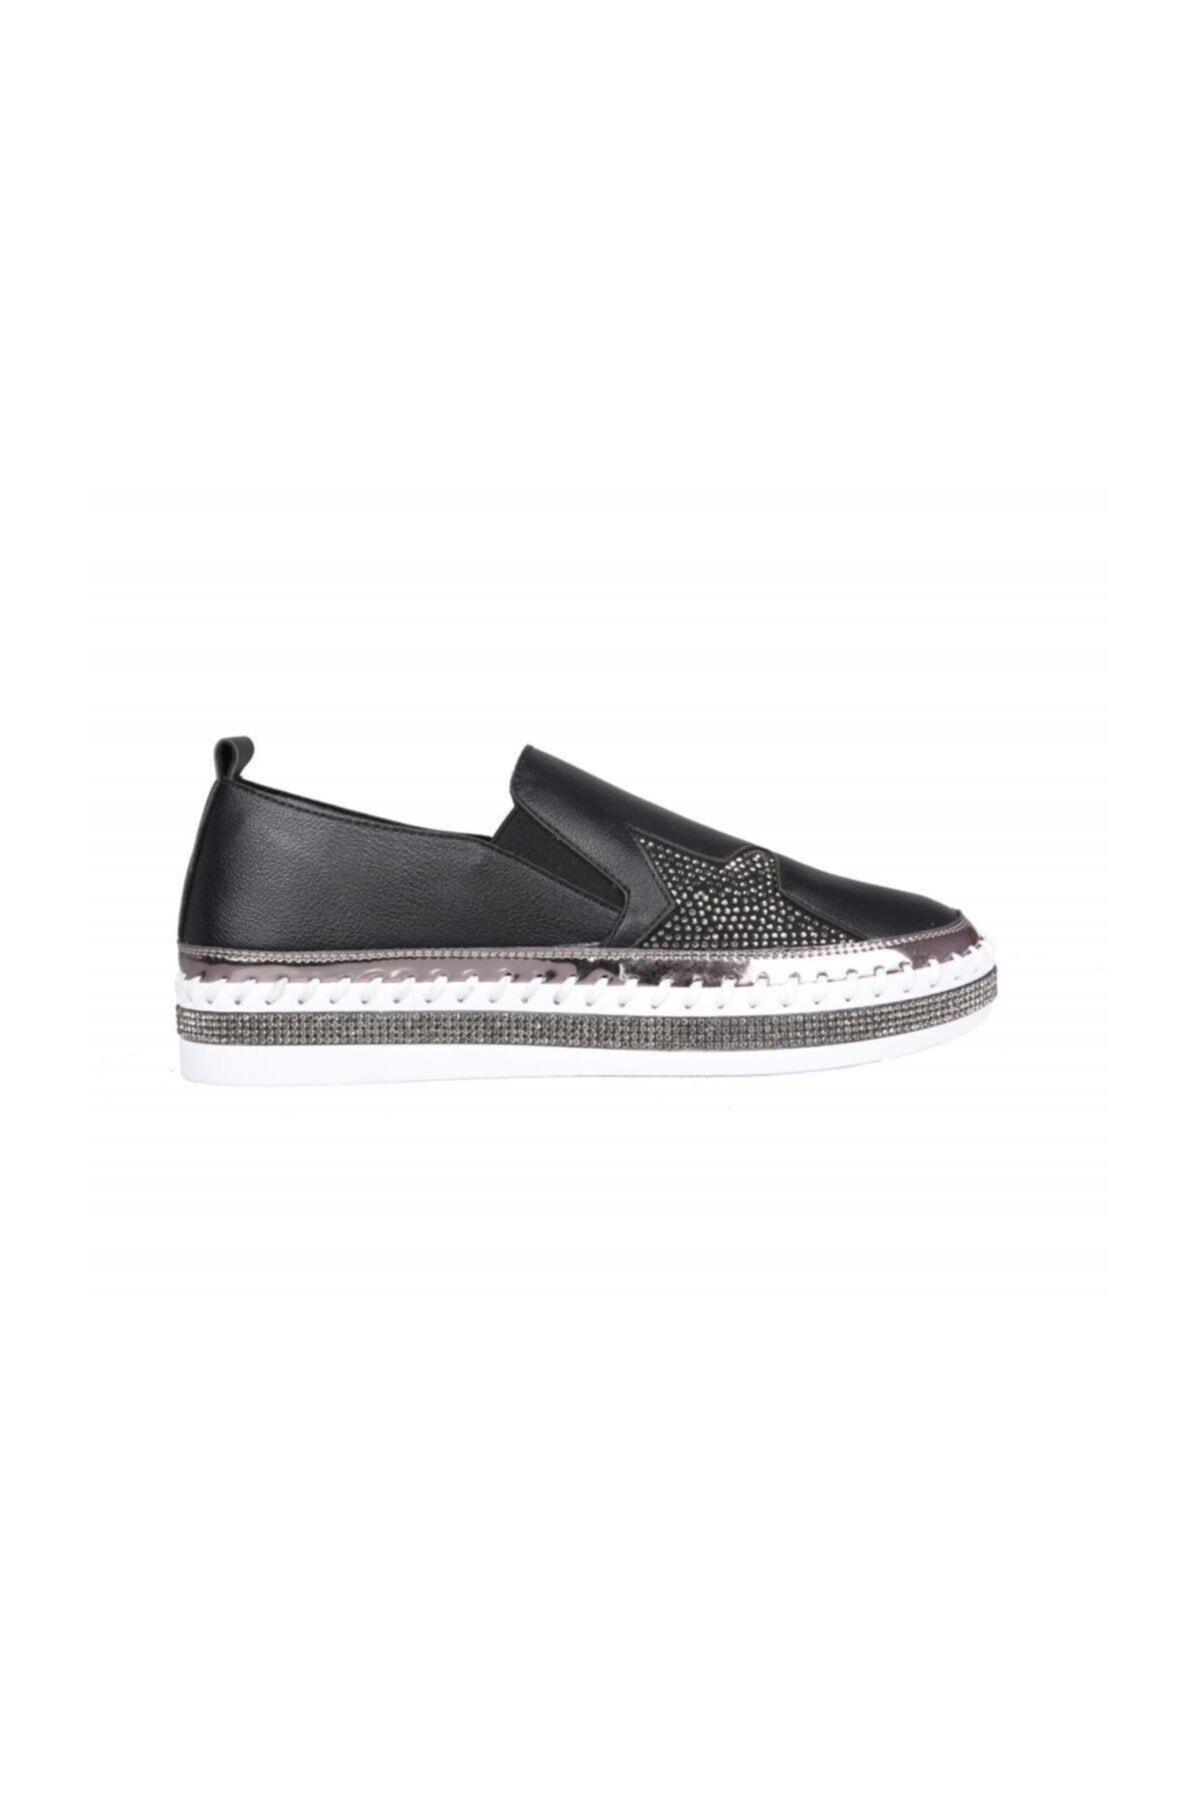 Guja Dolgu Topuk Siyah Kadın Sneakers